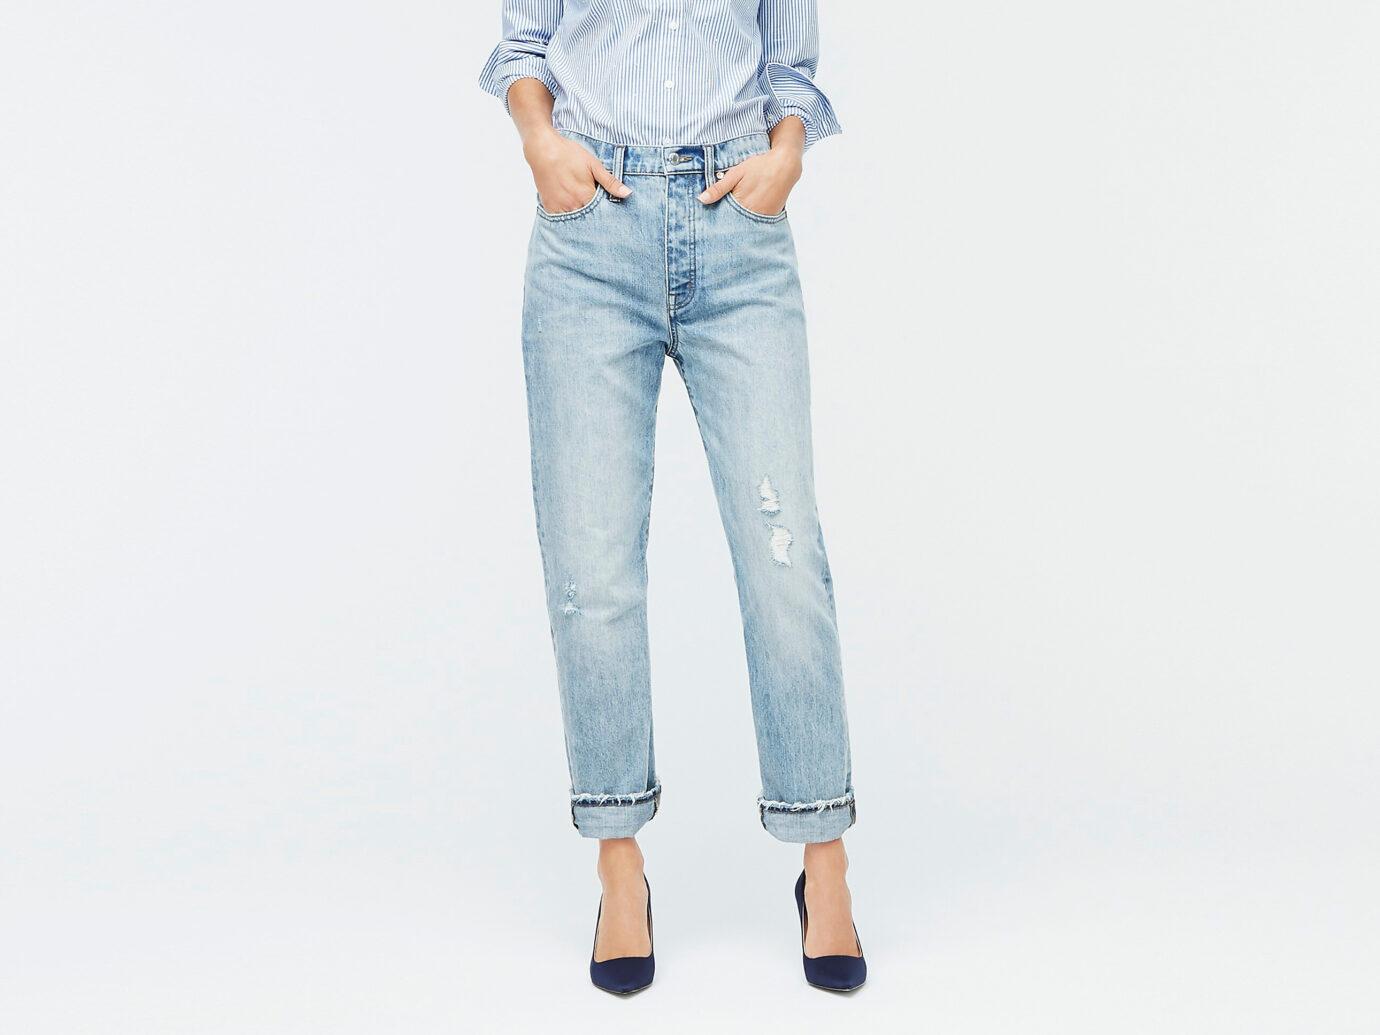 J.Crew Women's Point Sur Slouchy Boyfriend Jeans